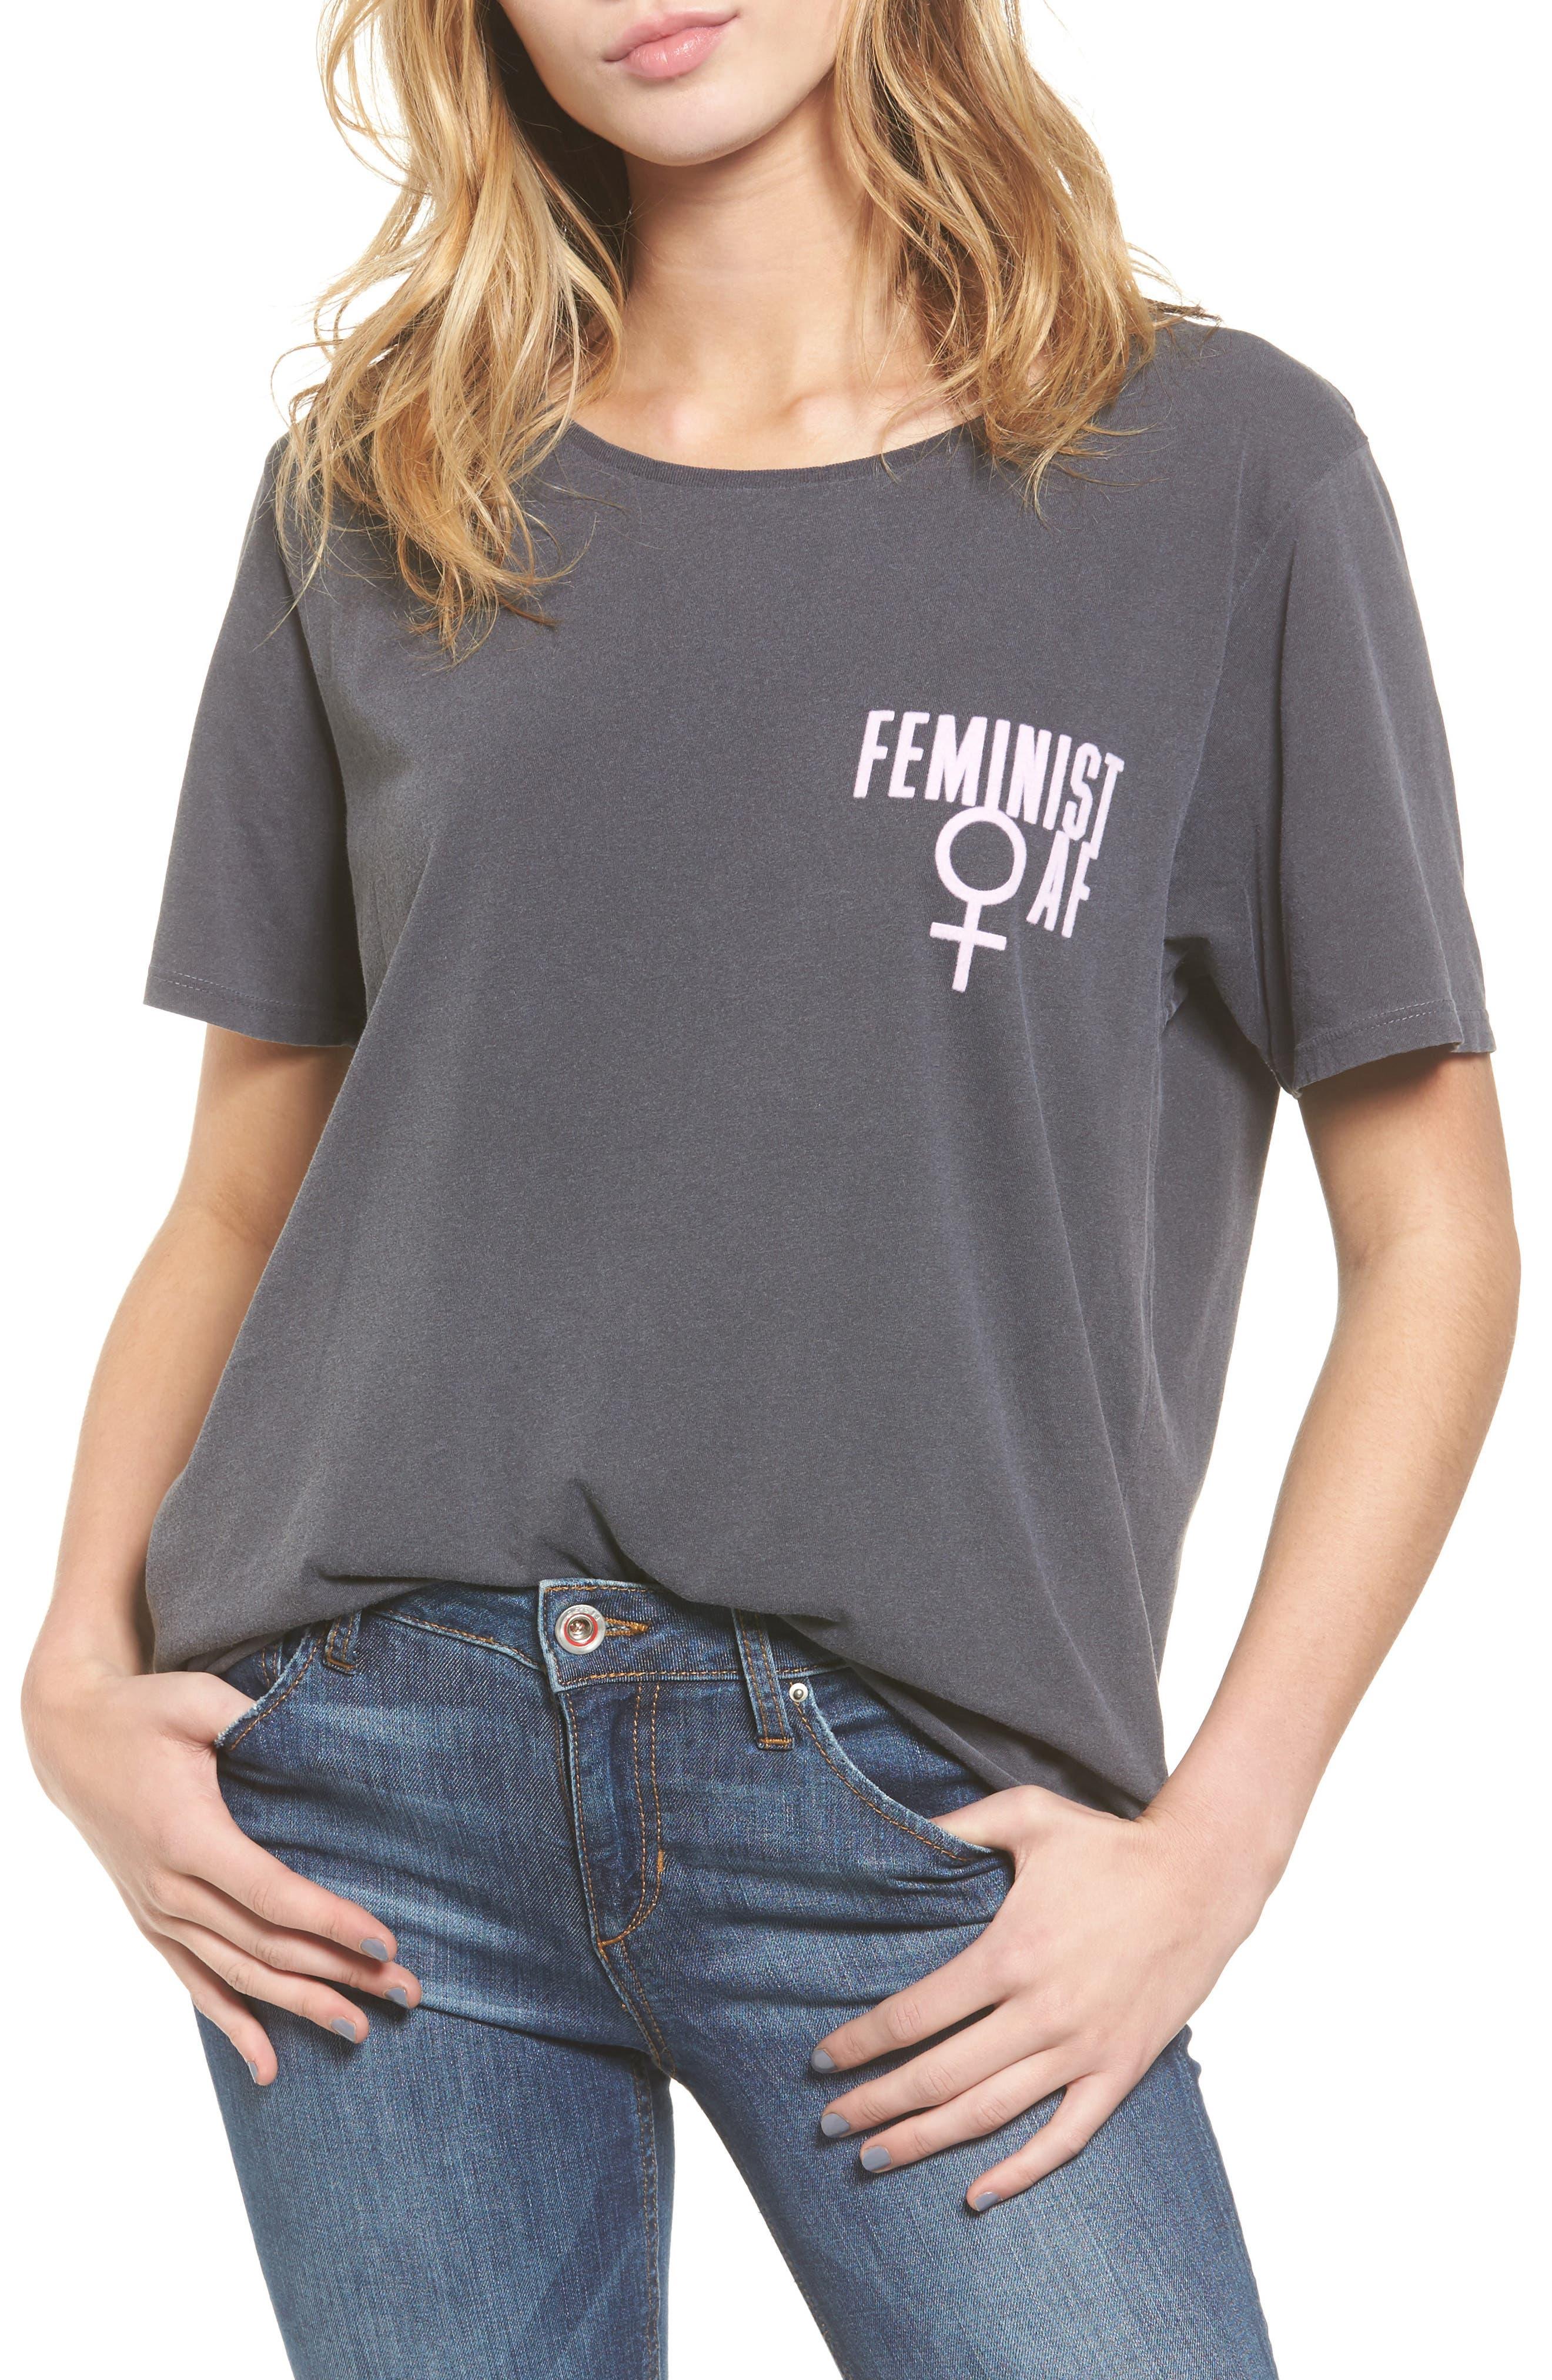 Alternate Image 1 Selected - Junk Food Feminist Tee